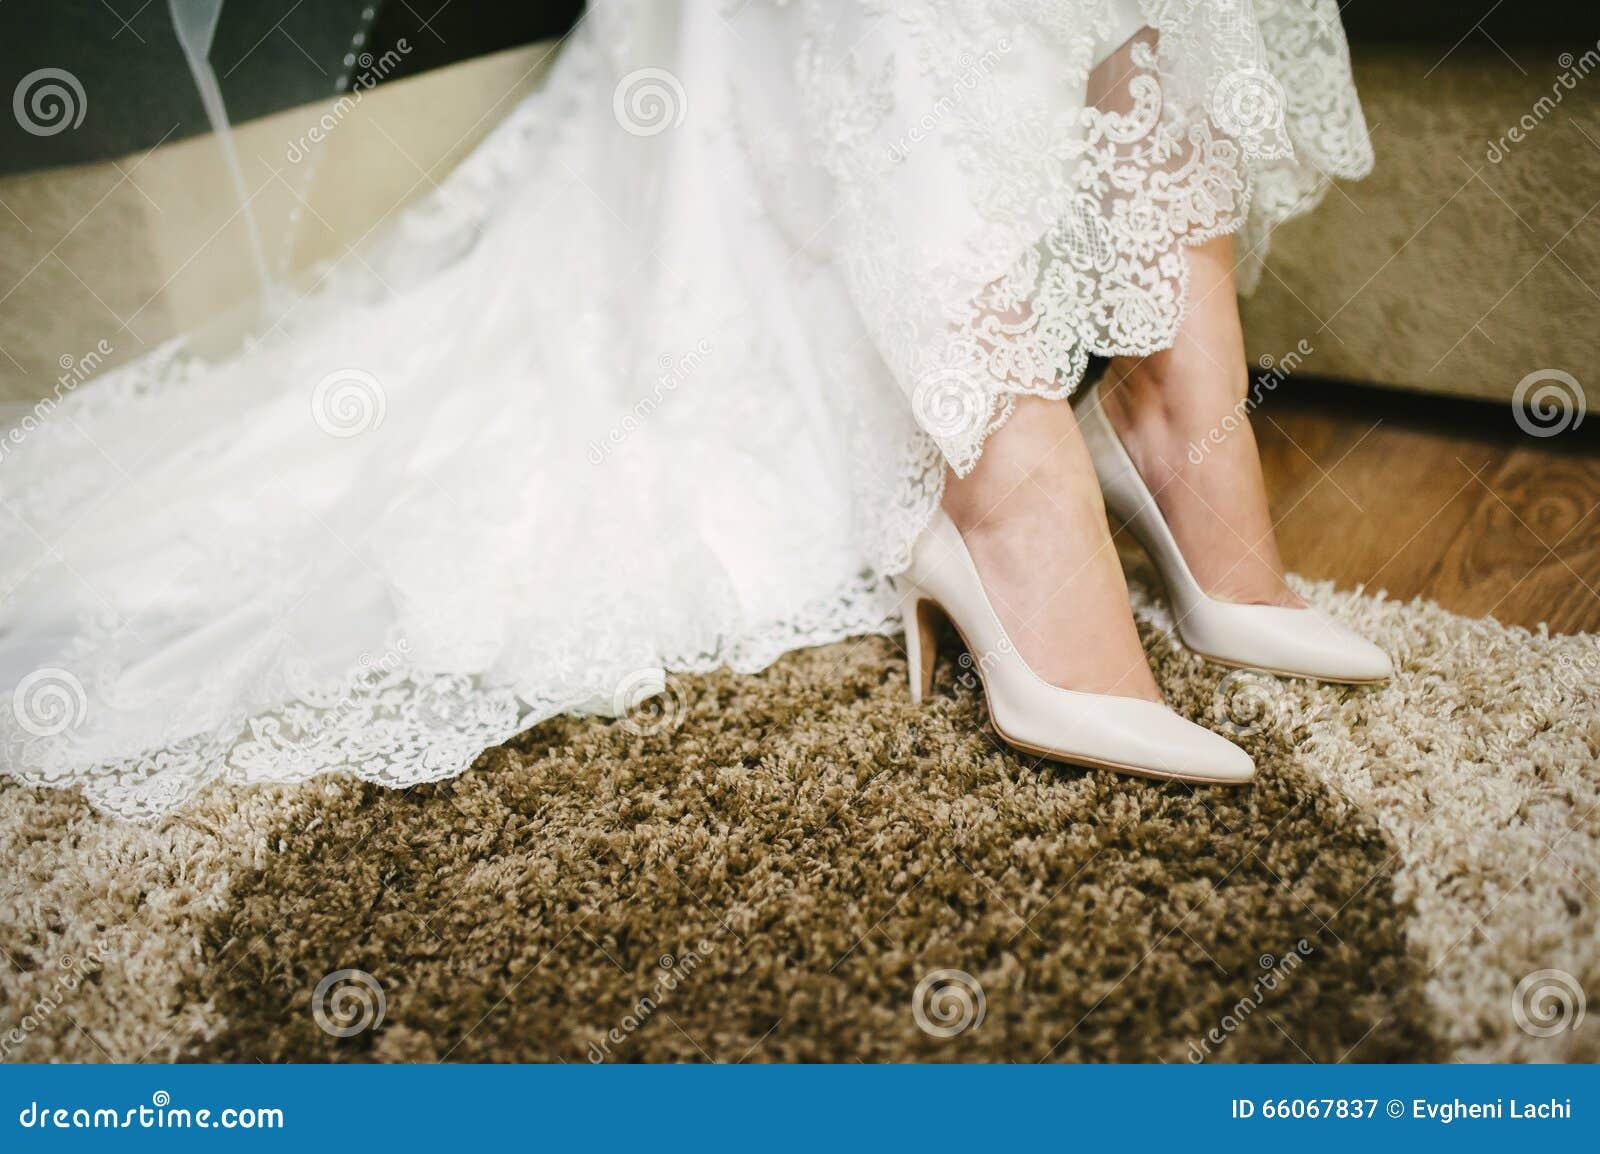 e726d174962 Νύφη που παίρνει τα ντυμένα παπούτσια στη ημέρα γάμου της Στοκ ...